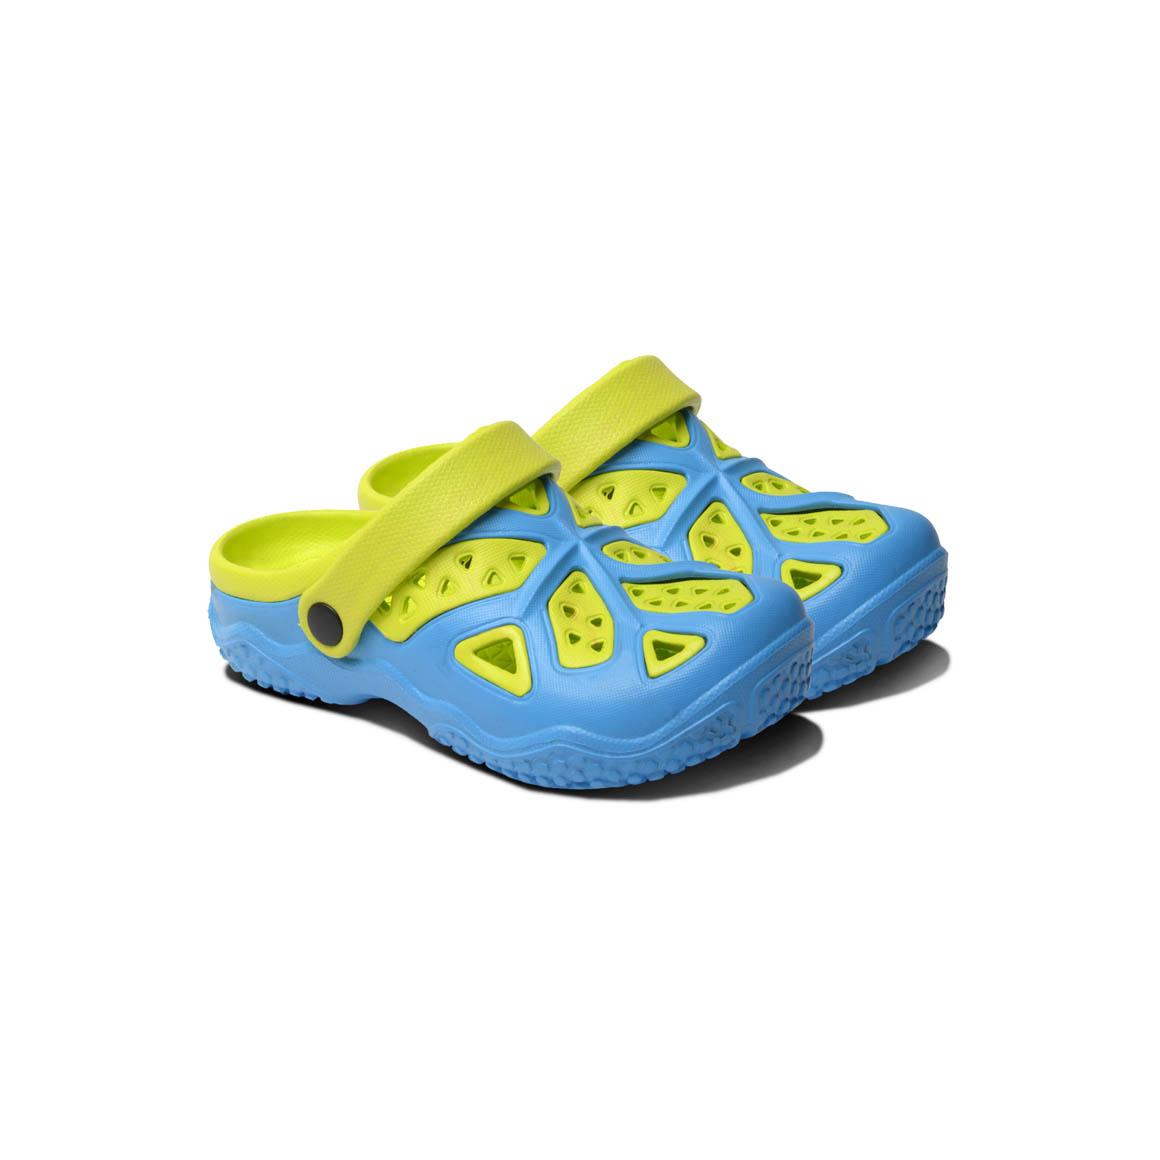 Kids Lightweight Clogs - Blue/Lime | Trada Marketplace